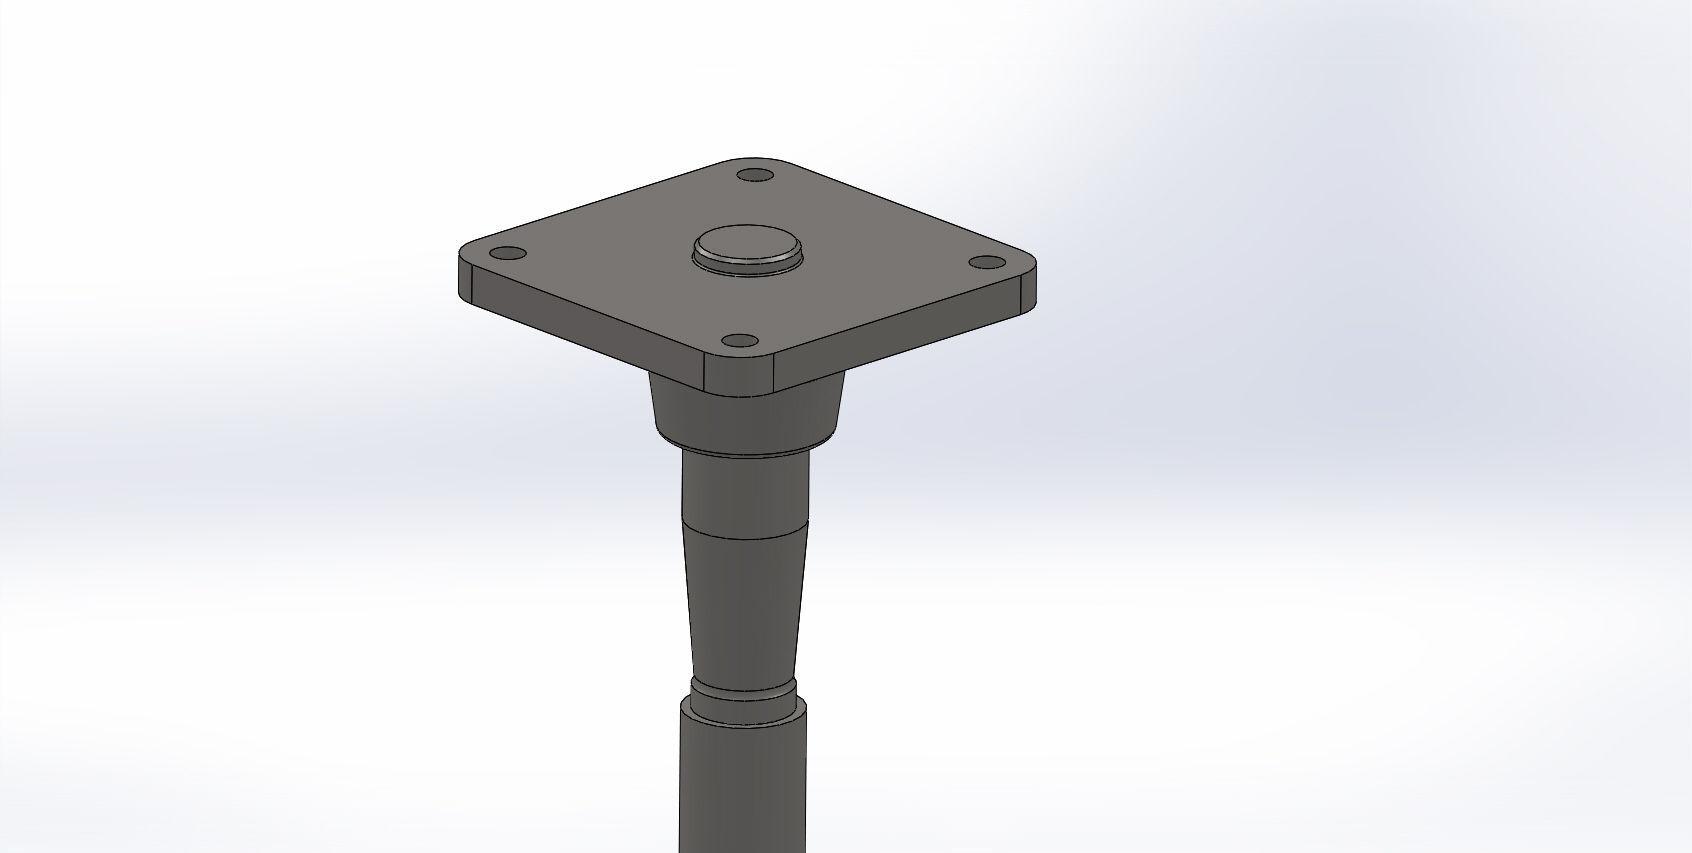 Pivot Pin Assembly : Pivot pin assembly free d model cgtrader